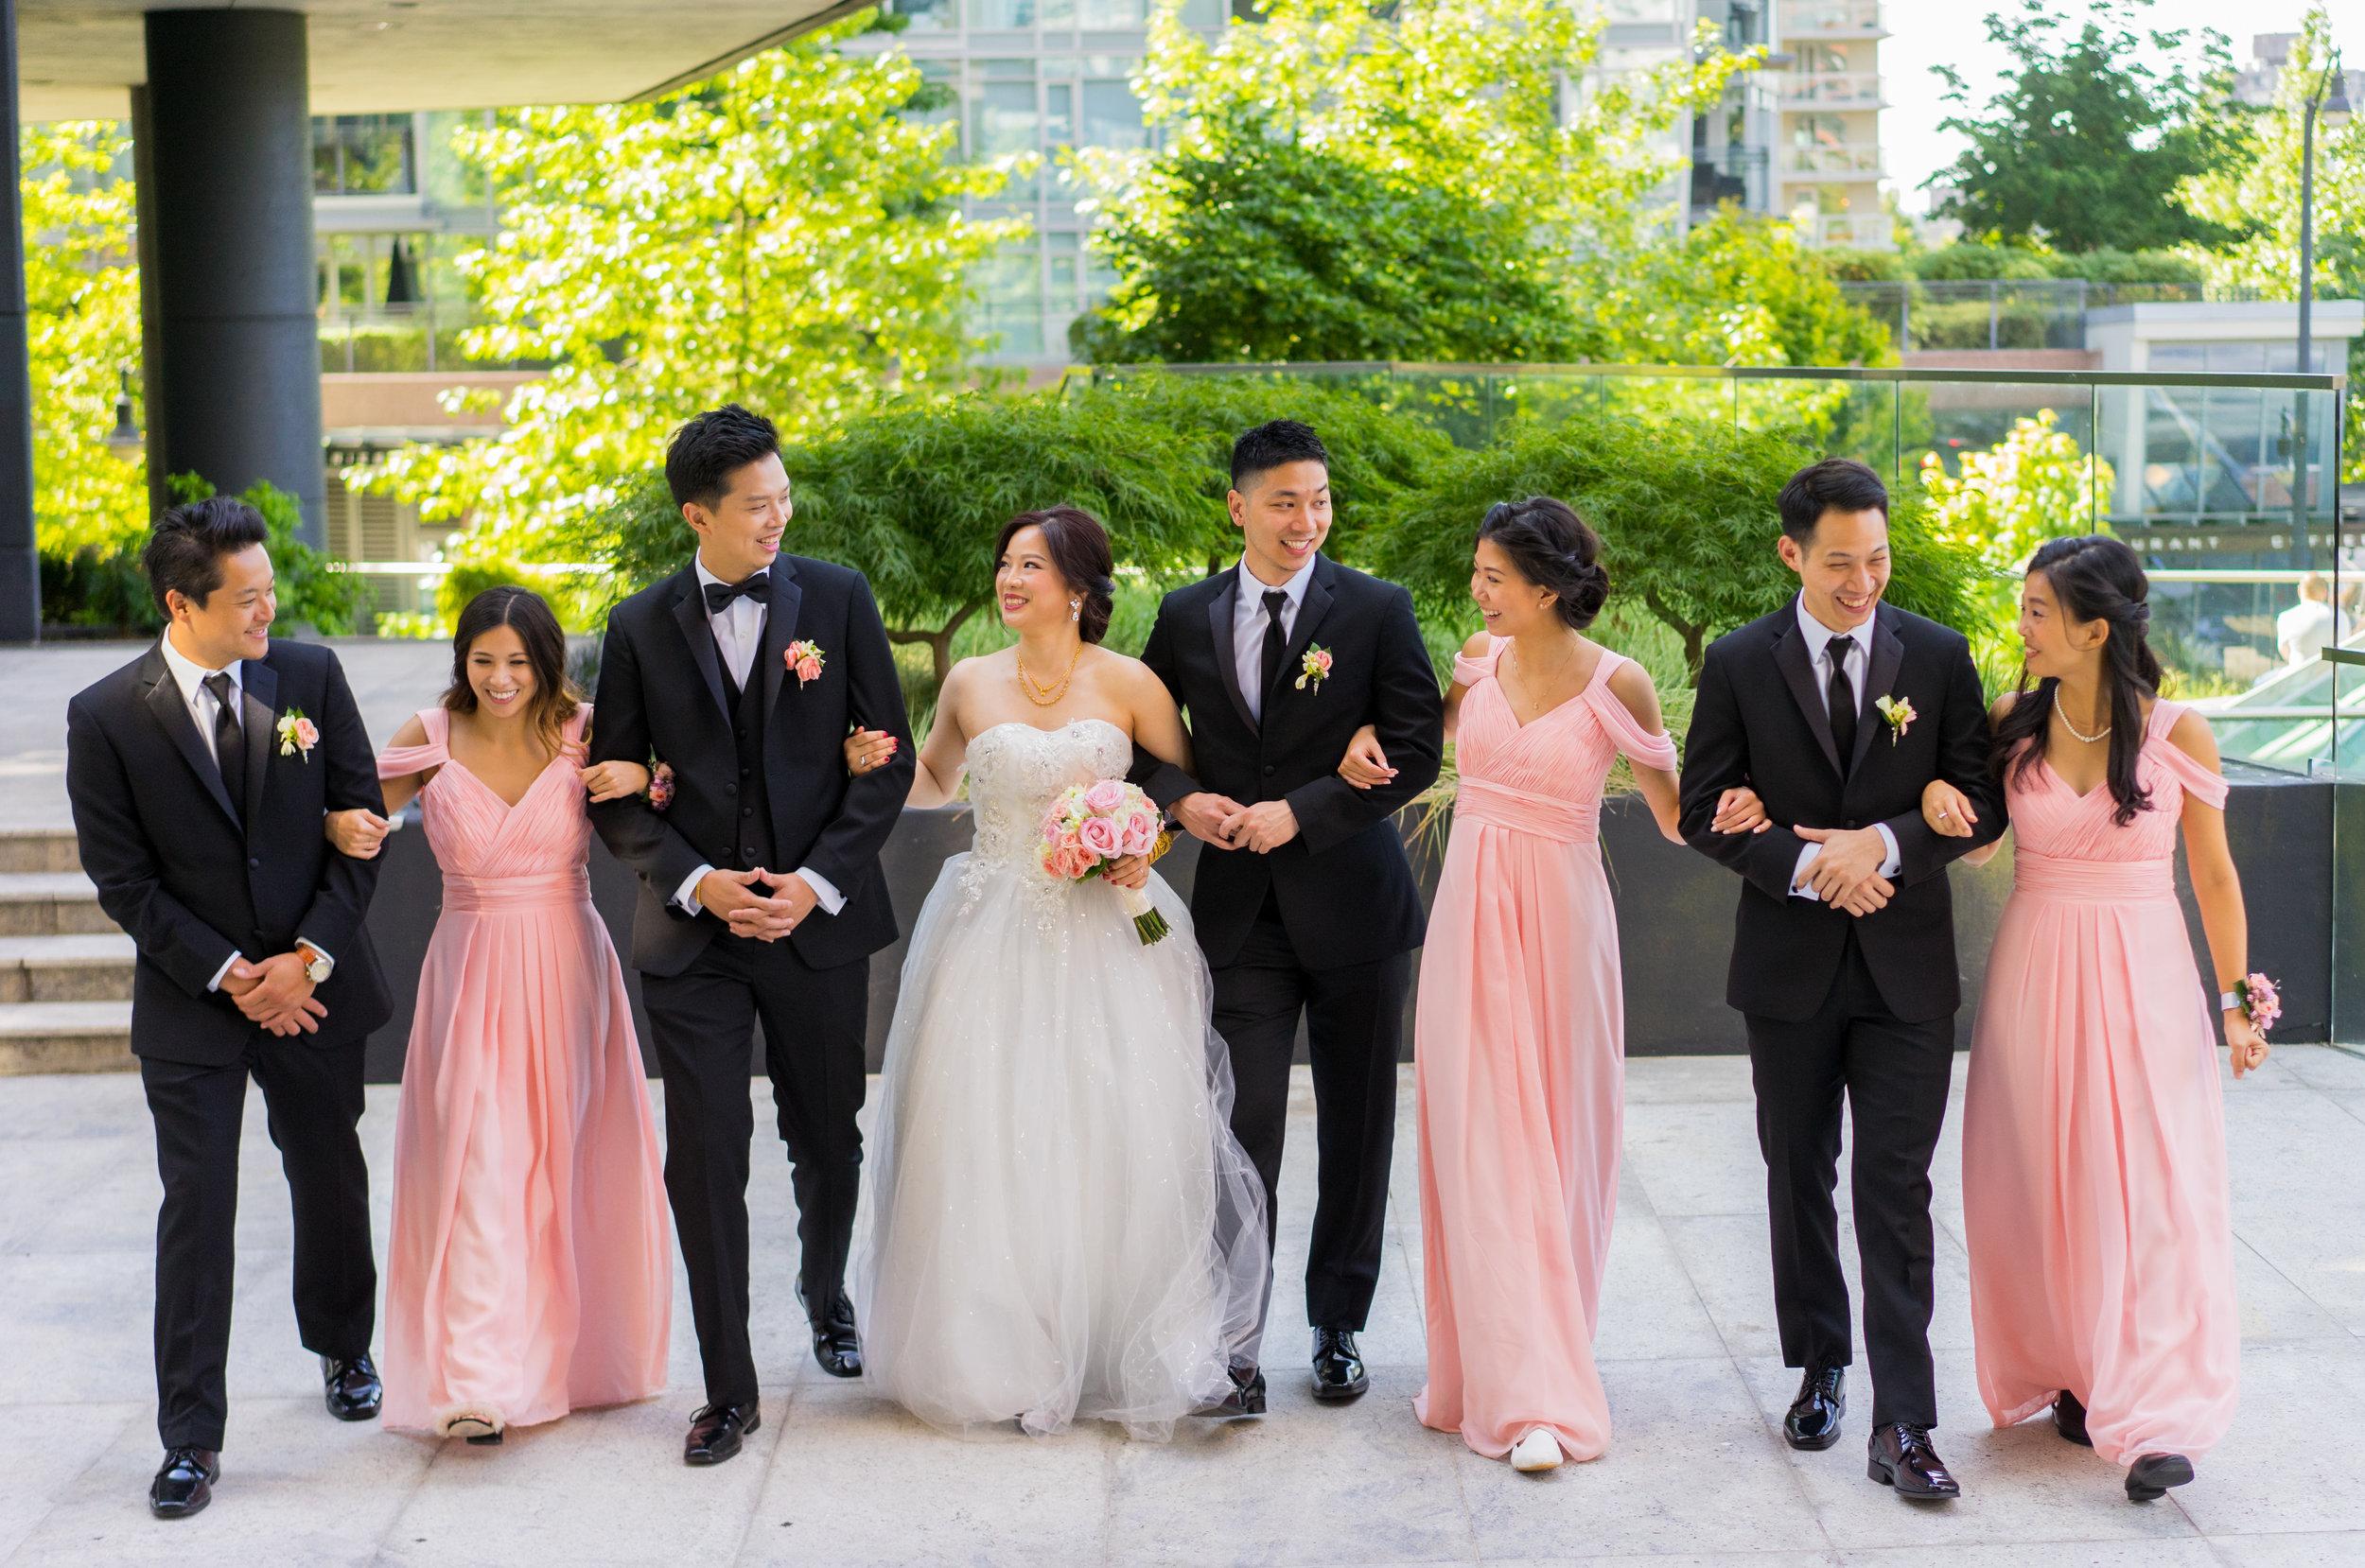 Yessica and Sam s Wedding-04 Bridal Portraits-0010.jpg